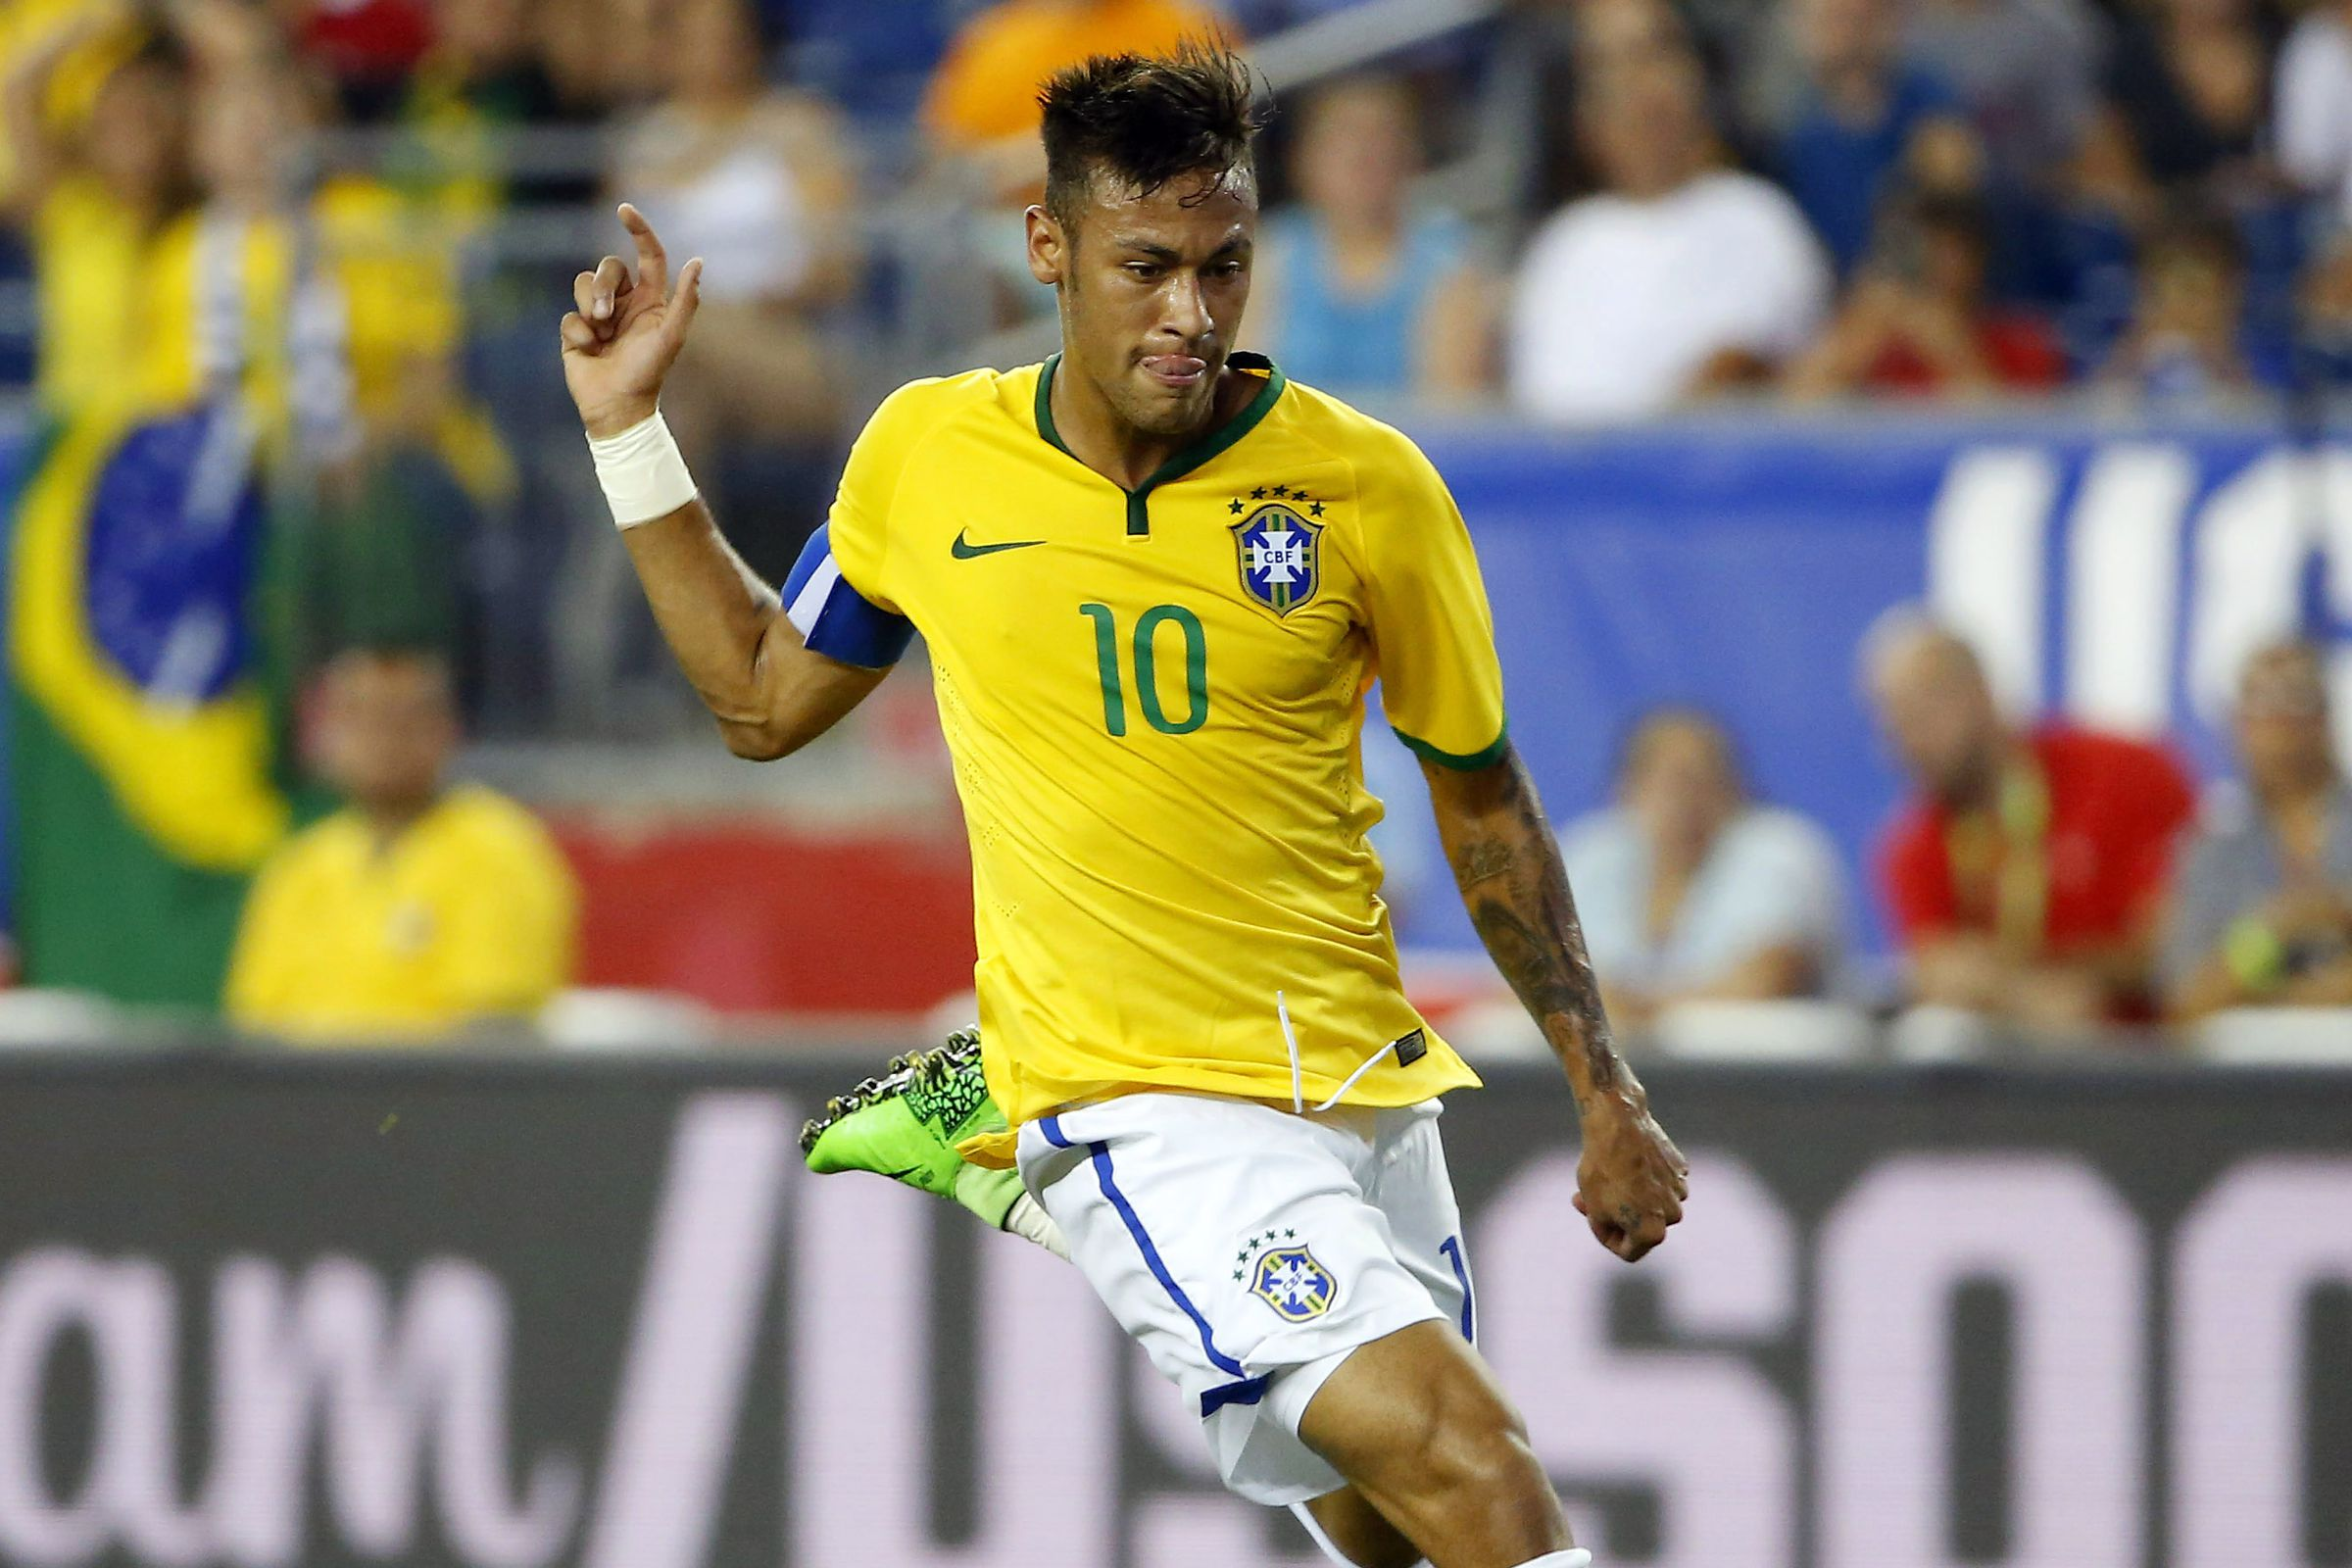 argentina vs brazil - photo #9